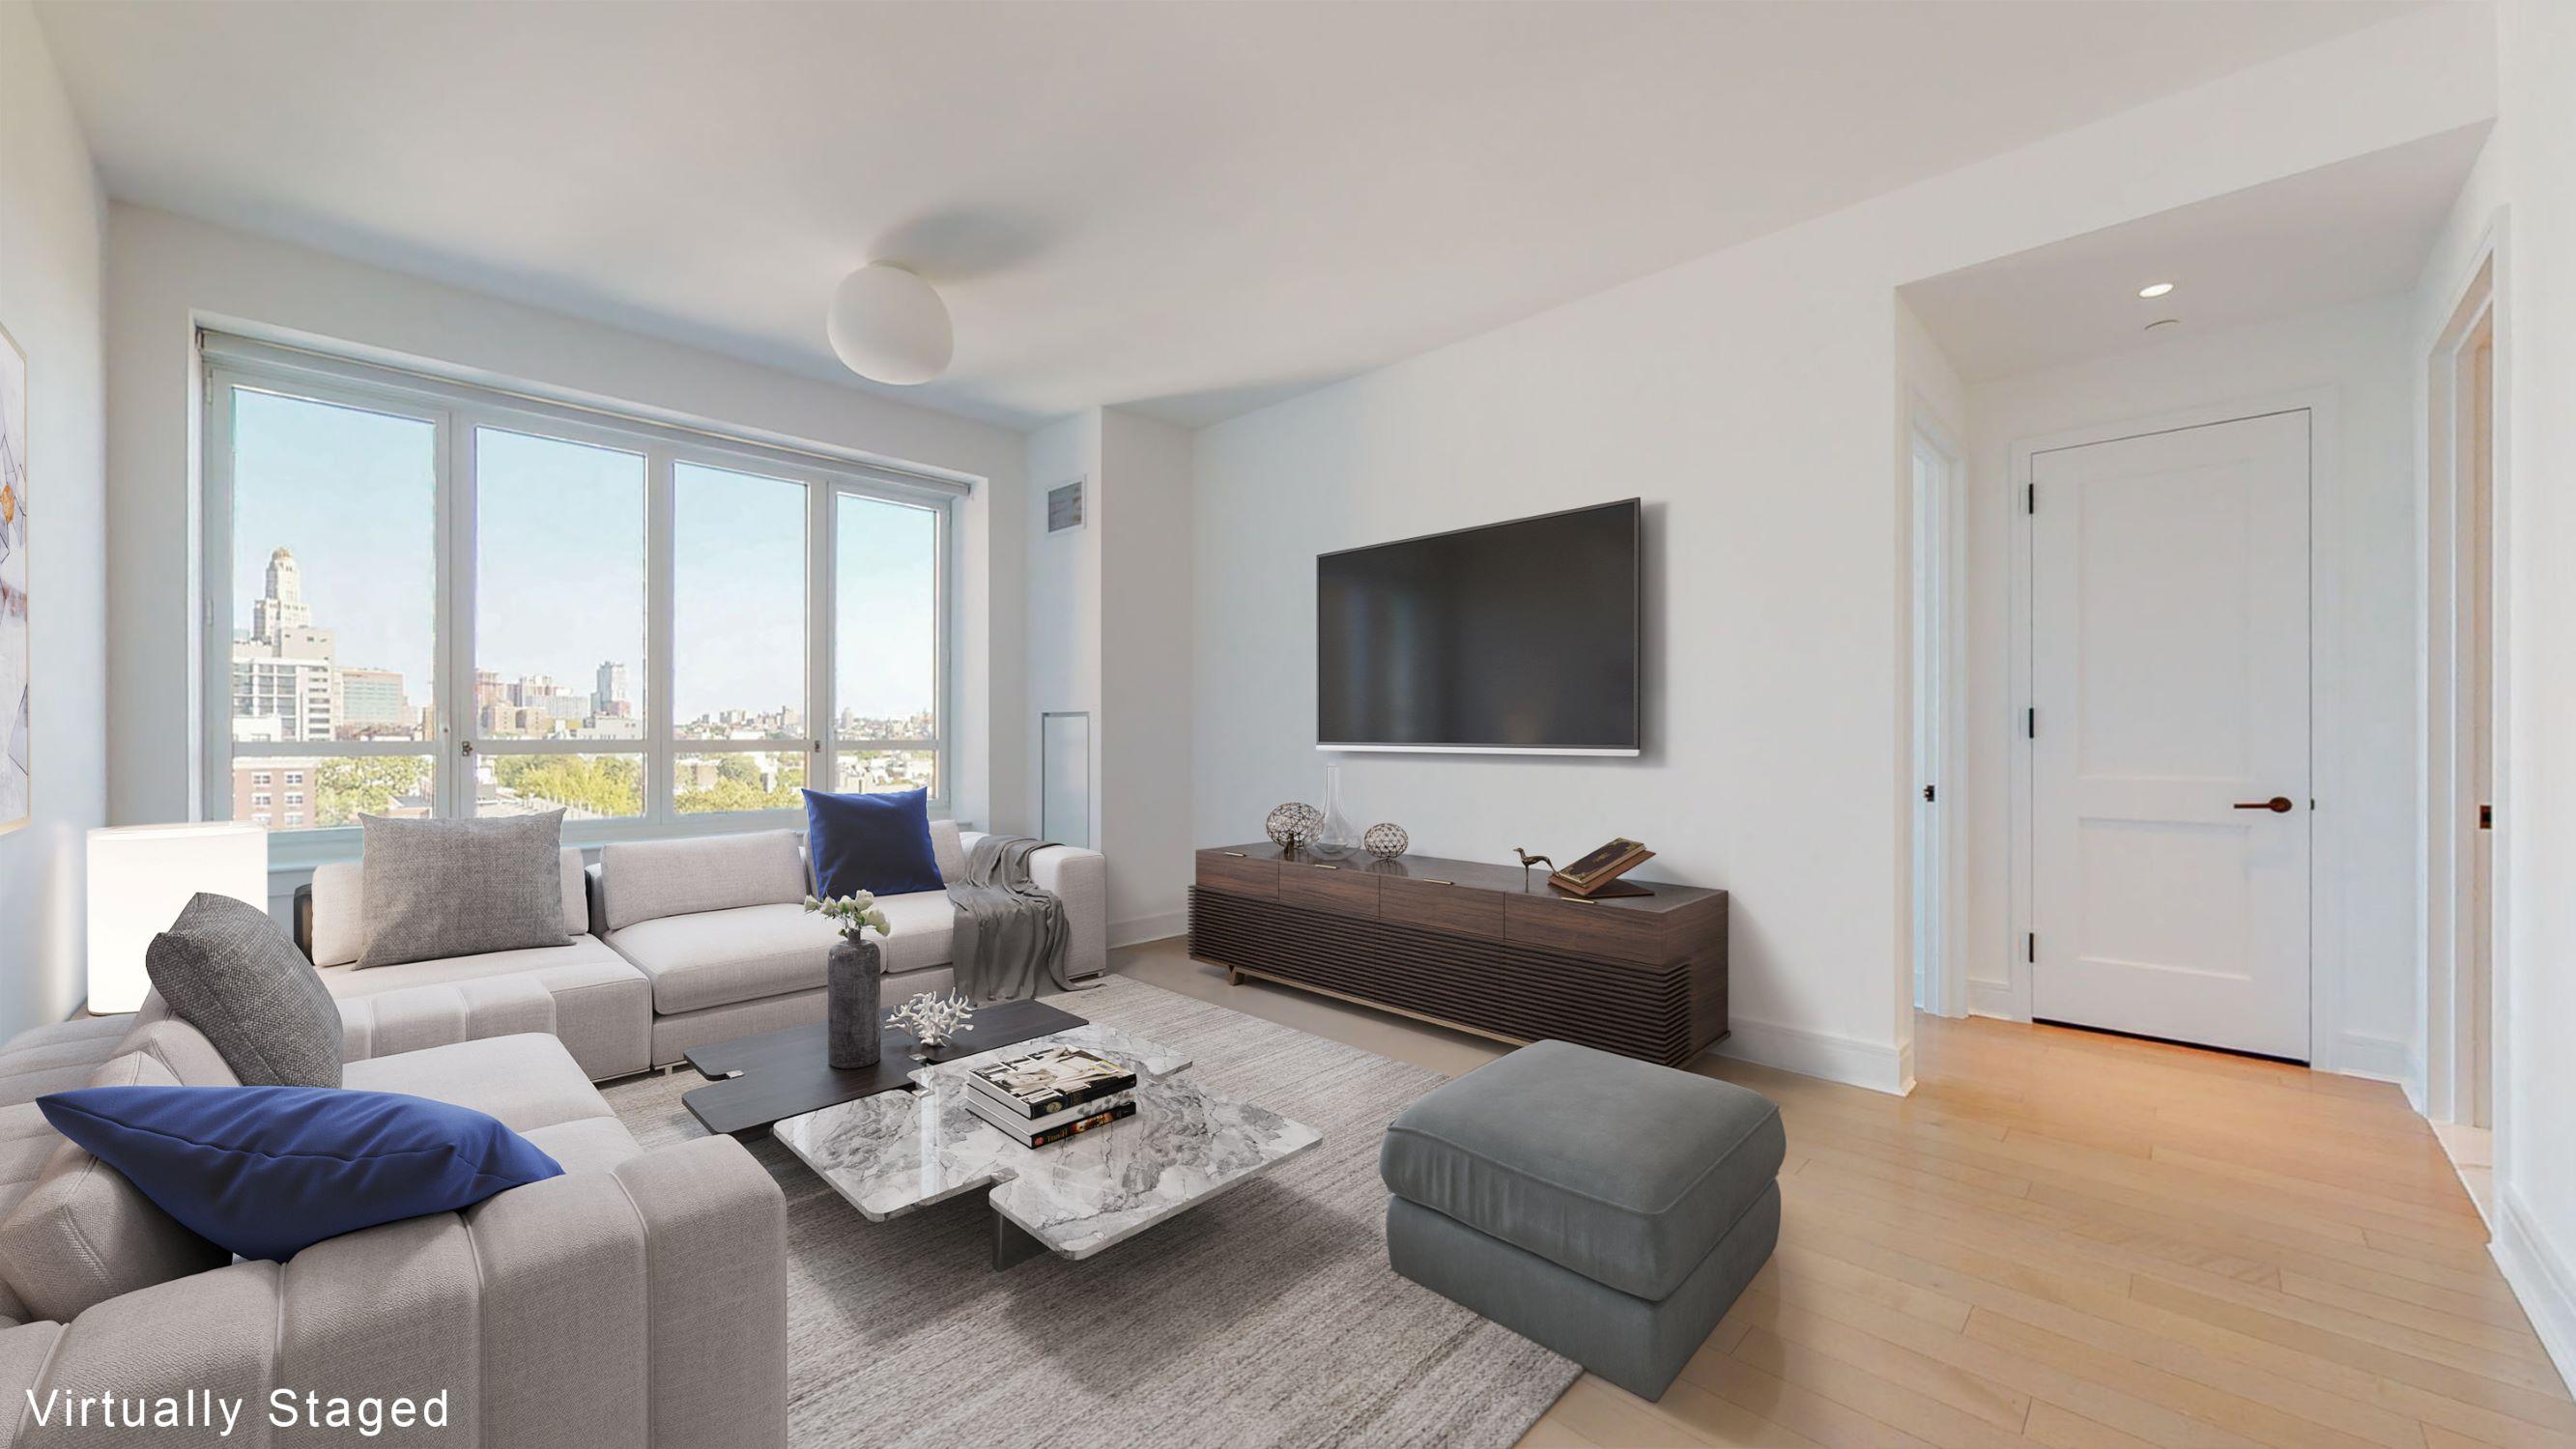 265 State Street, Brooklyn, Kings, New York, United States 11201, 2 Bedrooms Bedrooms, ,2 BathroomsBathrooms,Condo,FOR SALE,The Boerum,State Street,1143